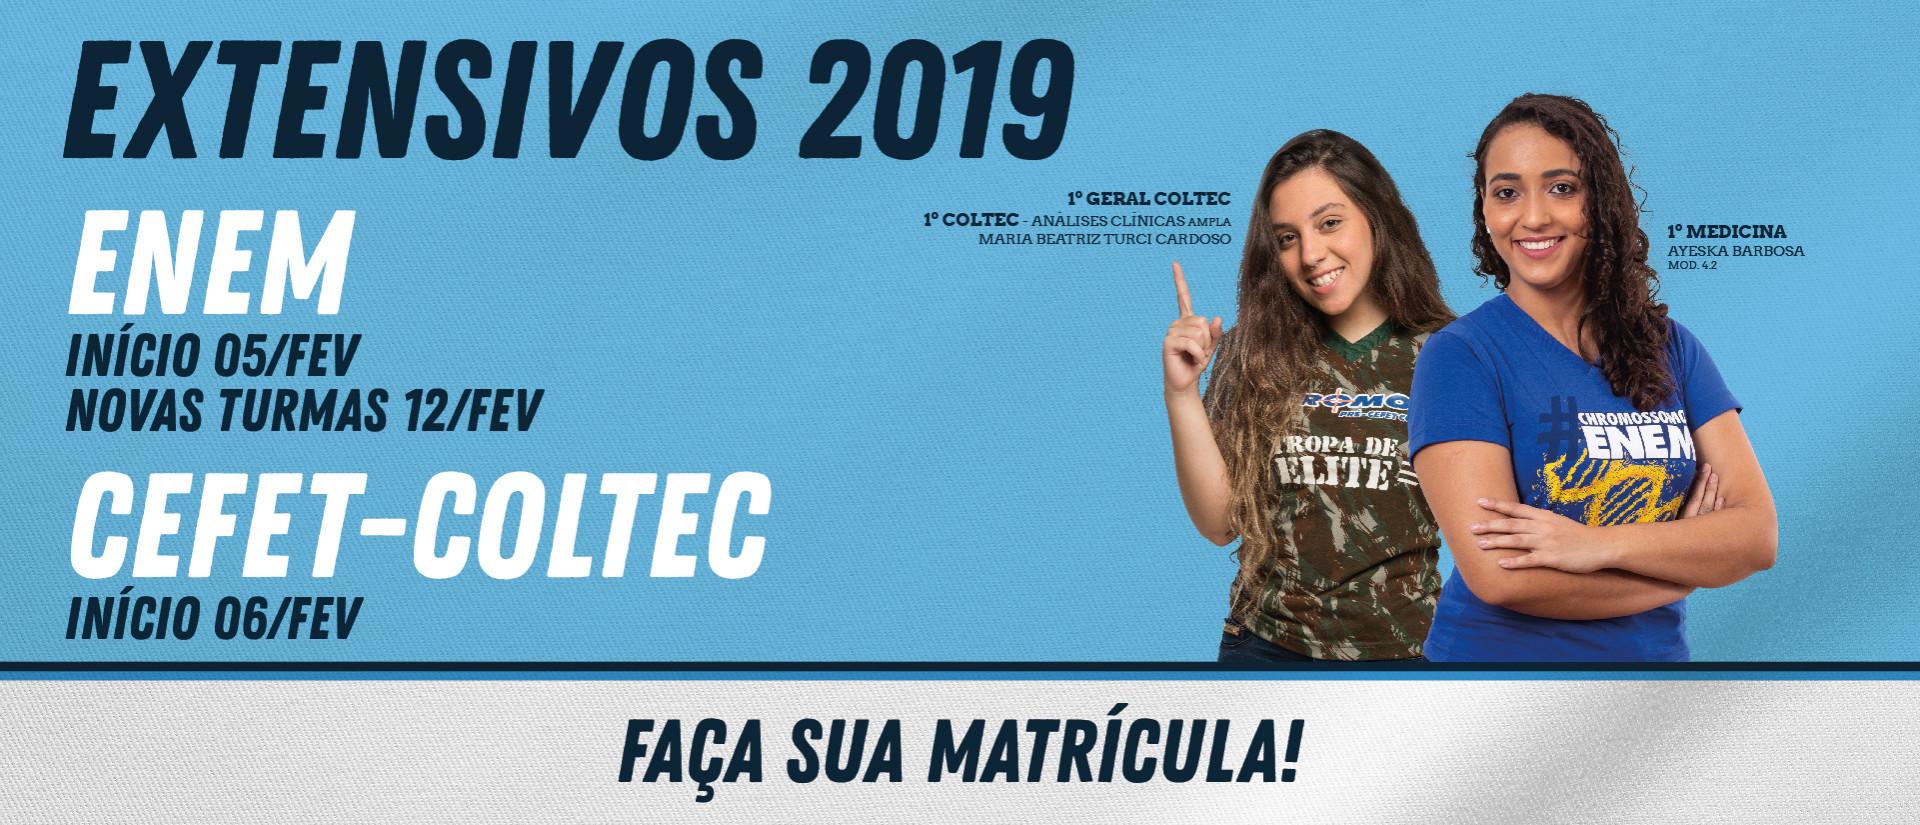 05-02 - Banner Home - Extensivos ENEM e CEFET-COLTEC 2019-01